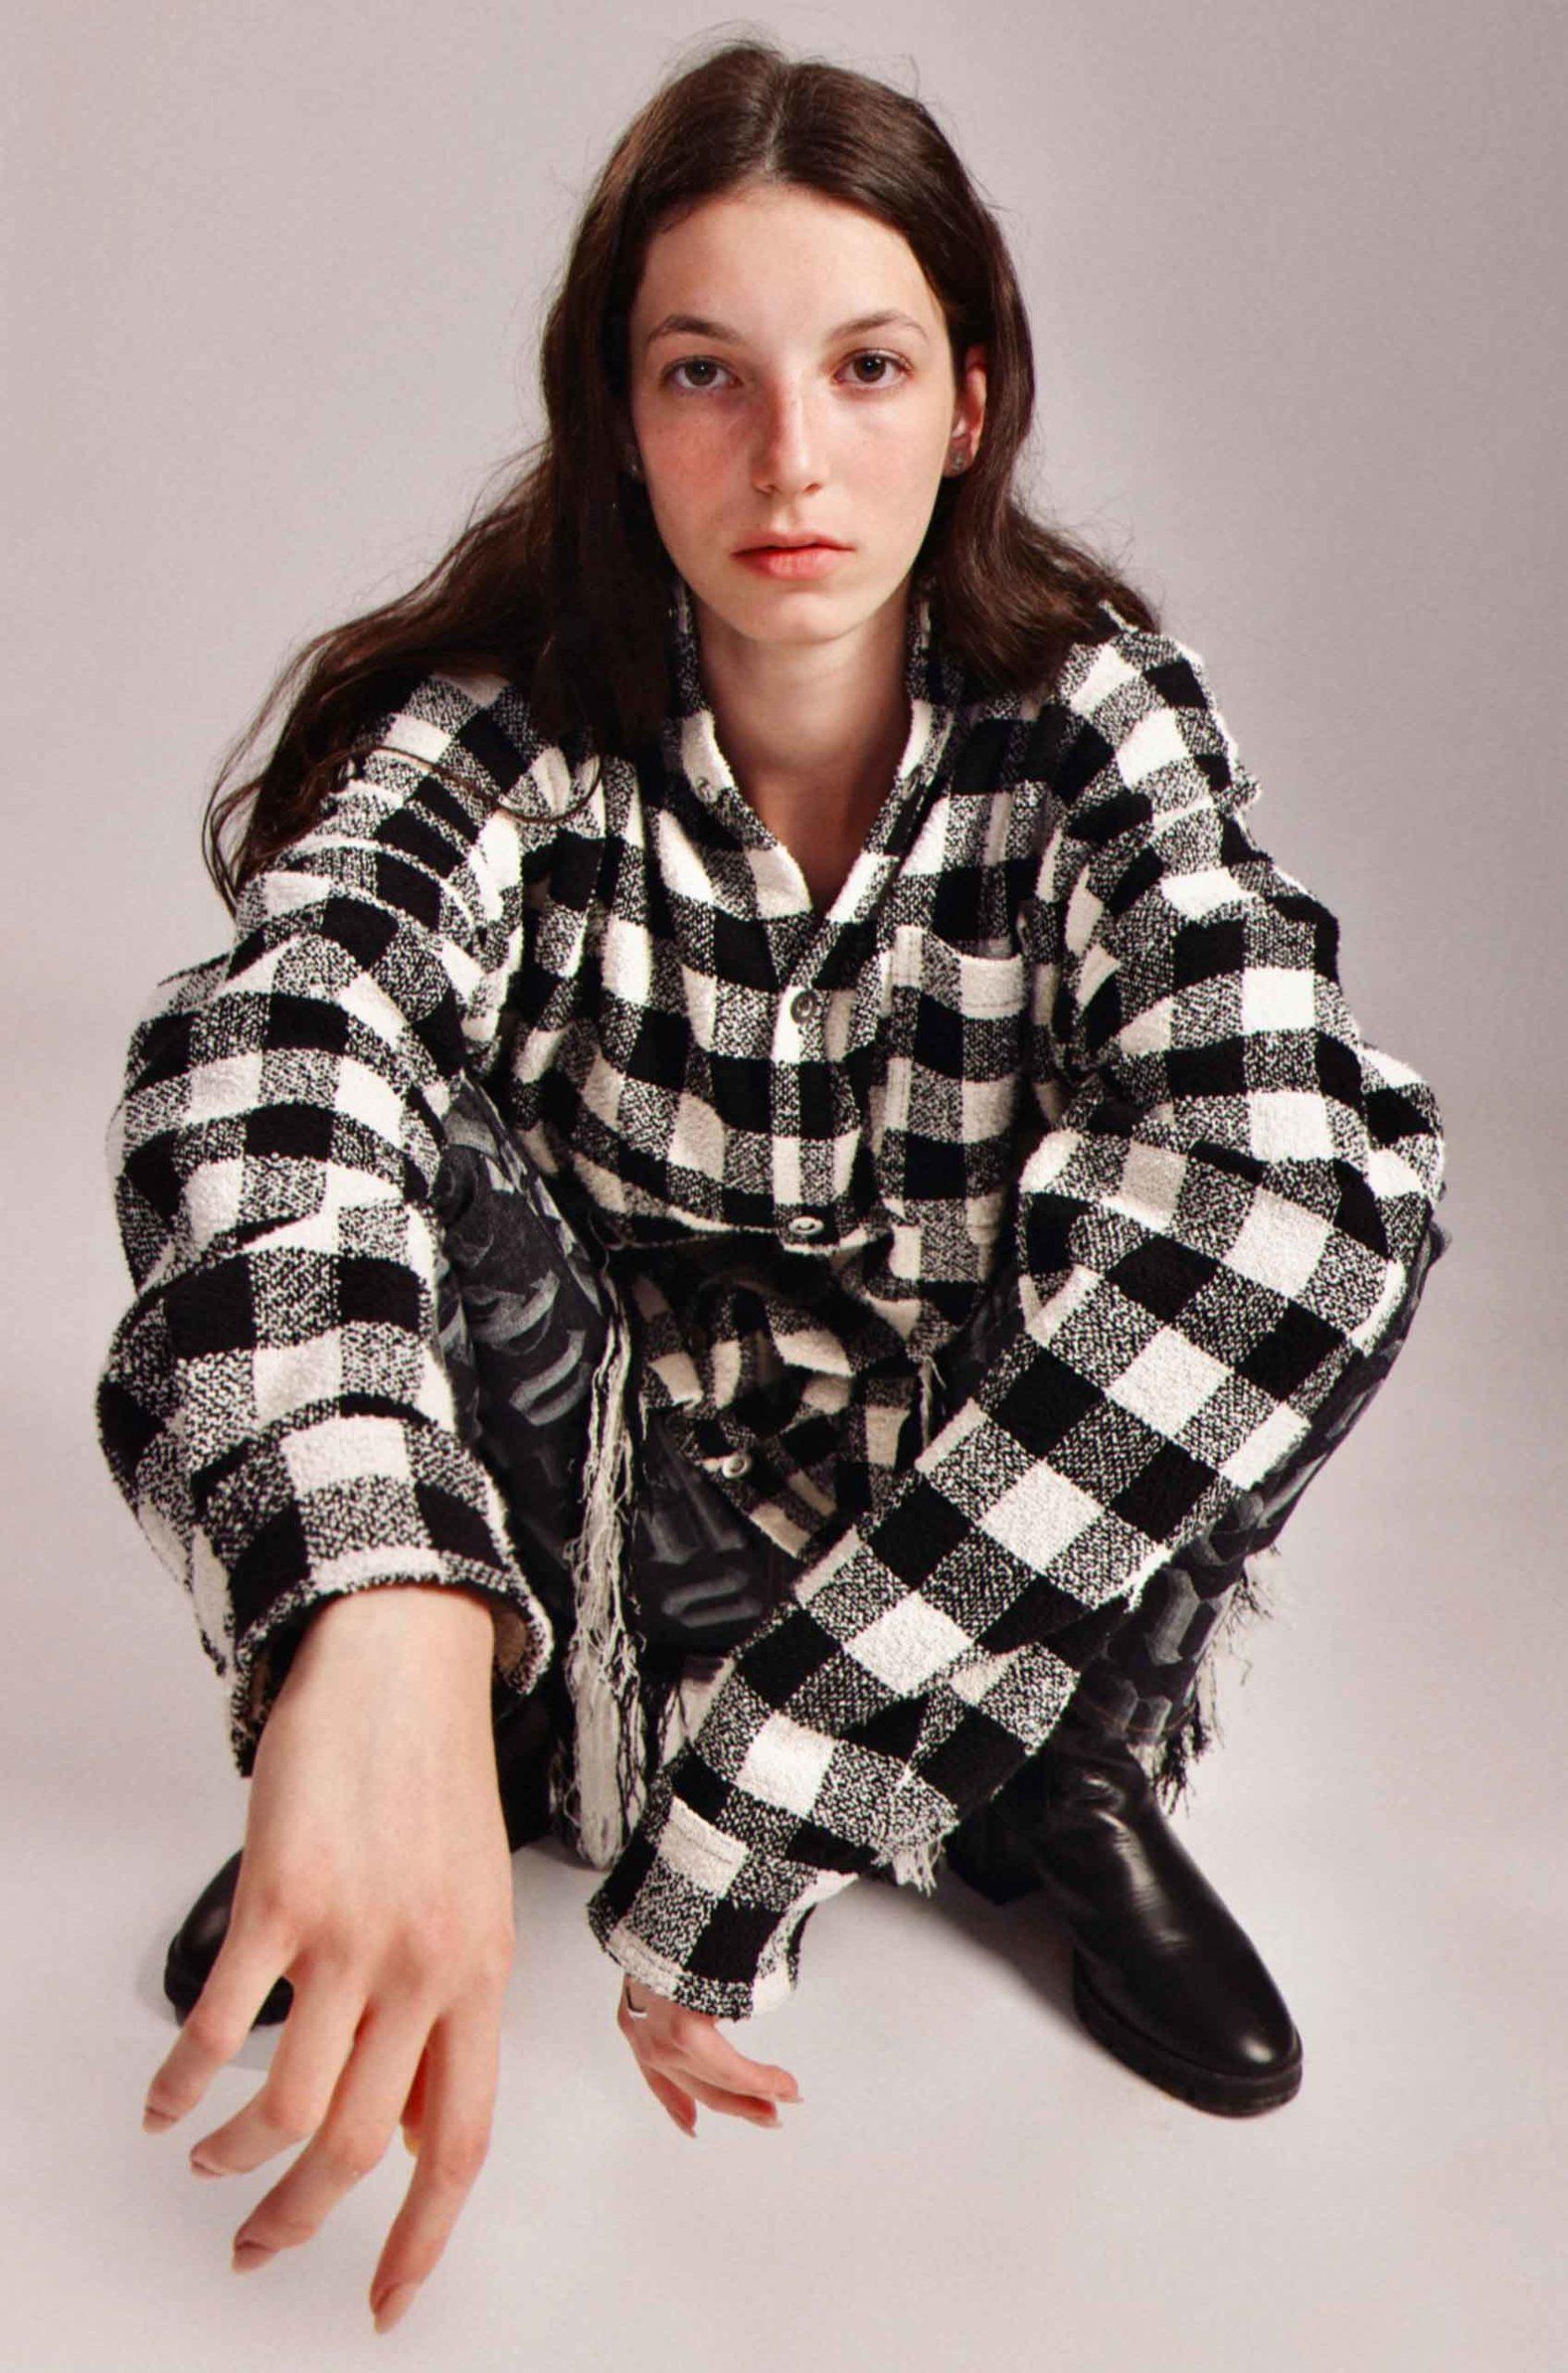 Photographer- Oz Shemesh, Styling - Maor Rabin, Hair - Maor kidushim Agency - yuligroup - Fashion Israel - מגזין אופנה ישראלי-13